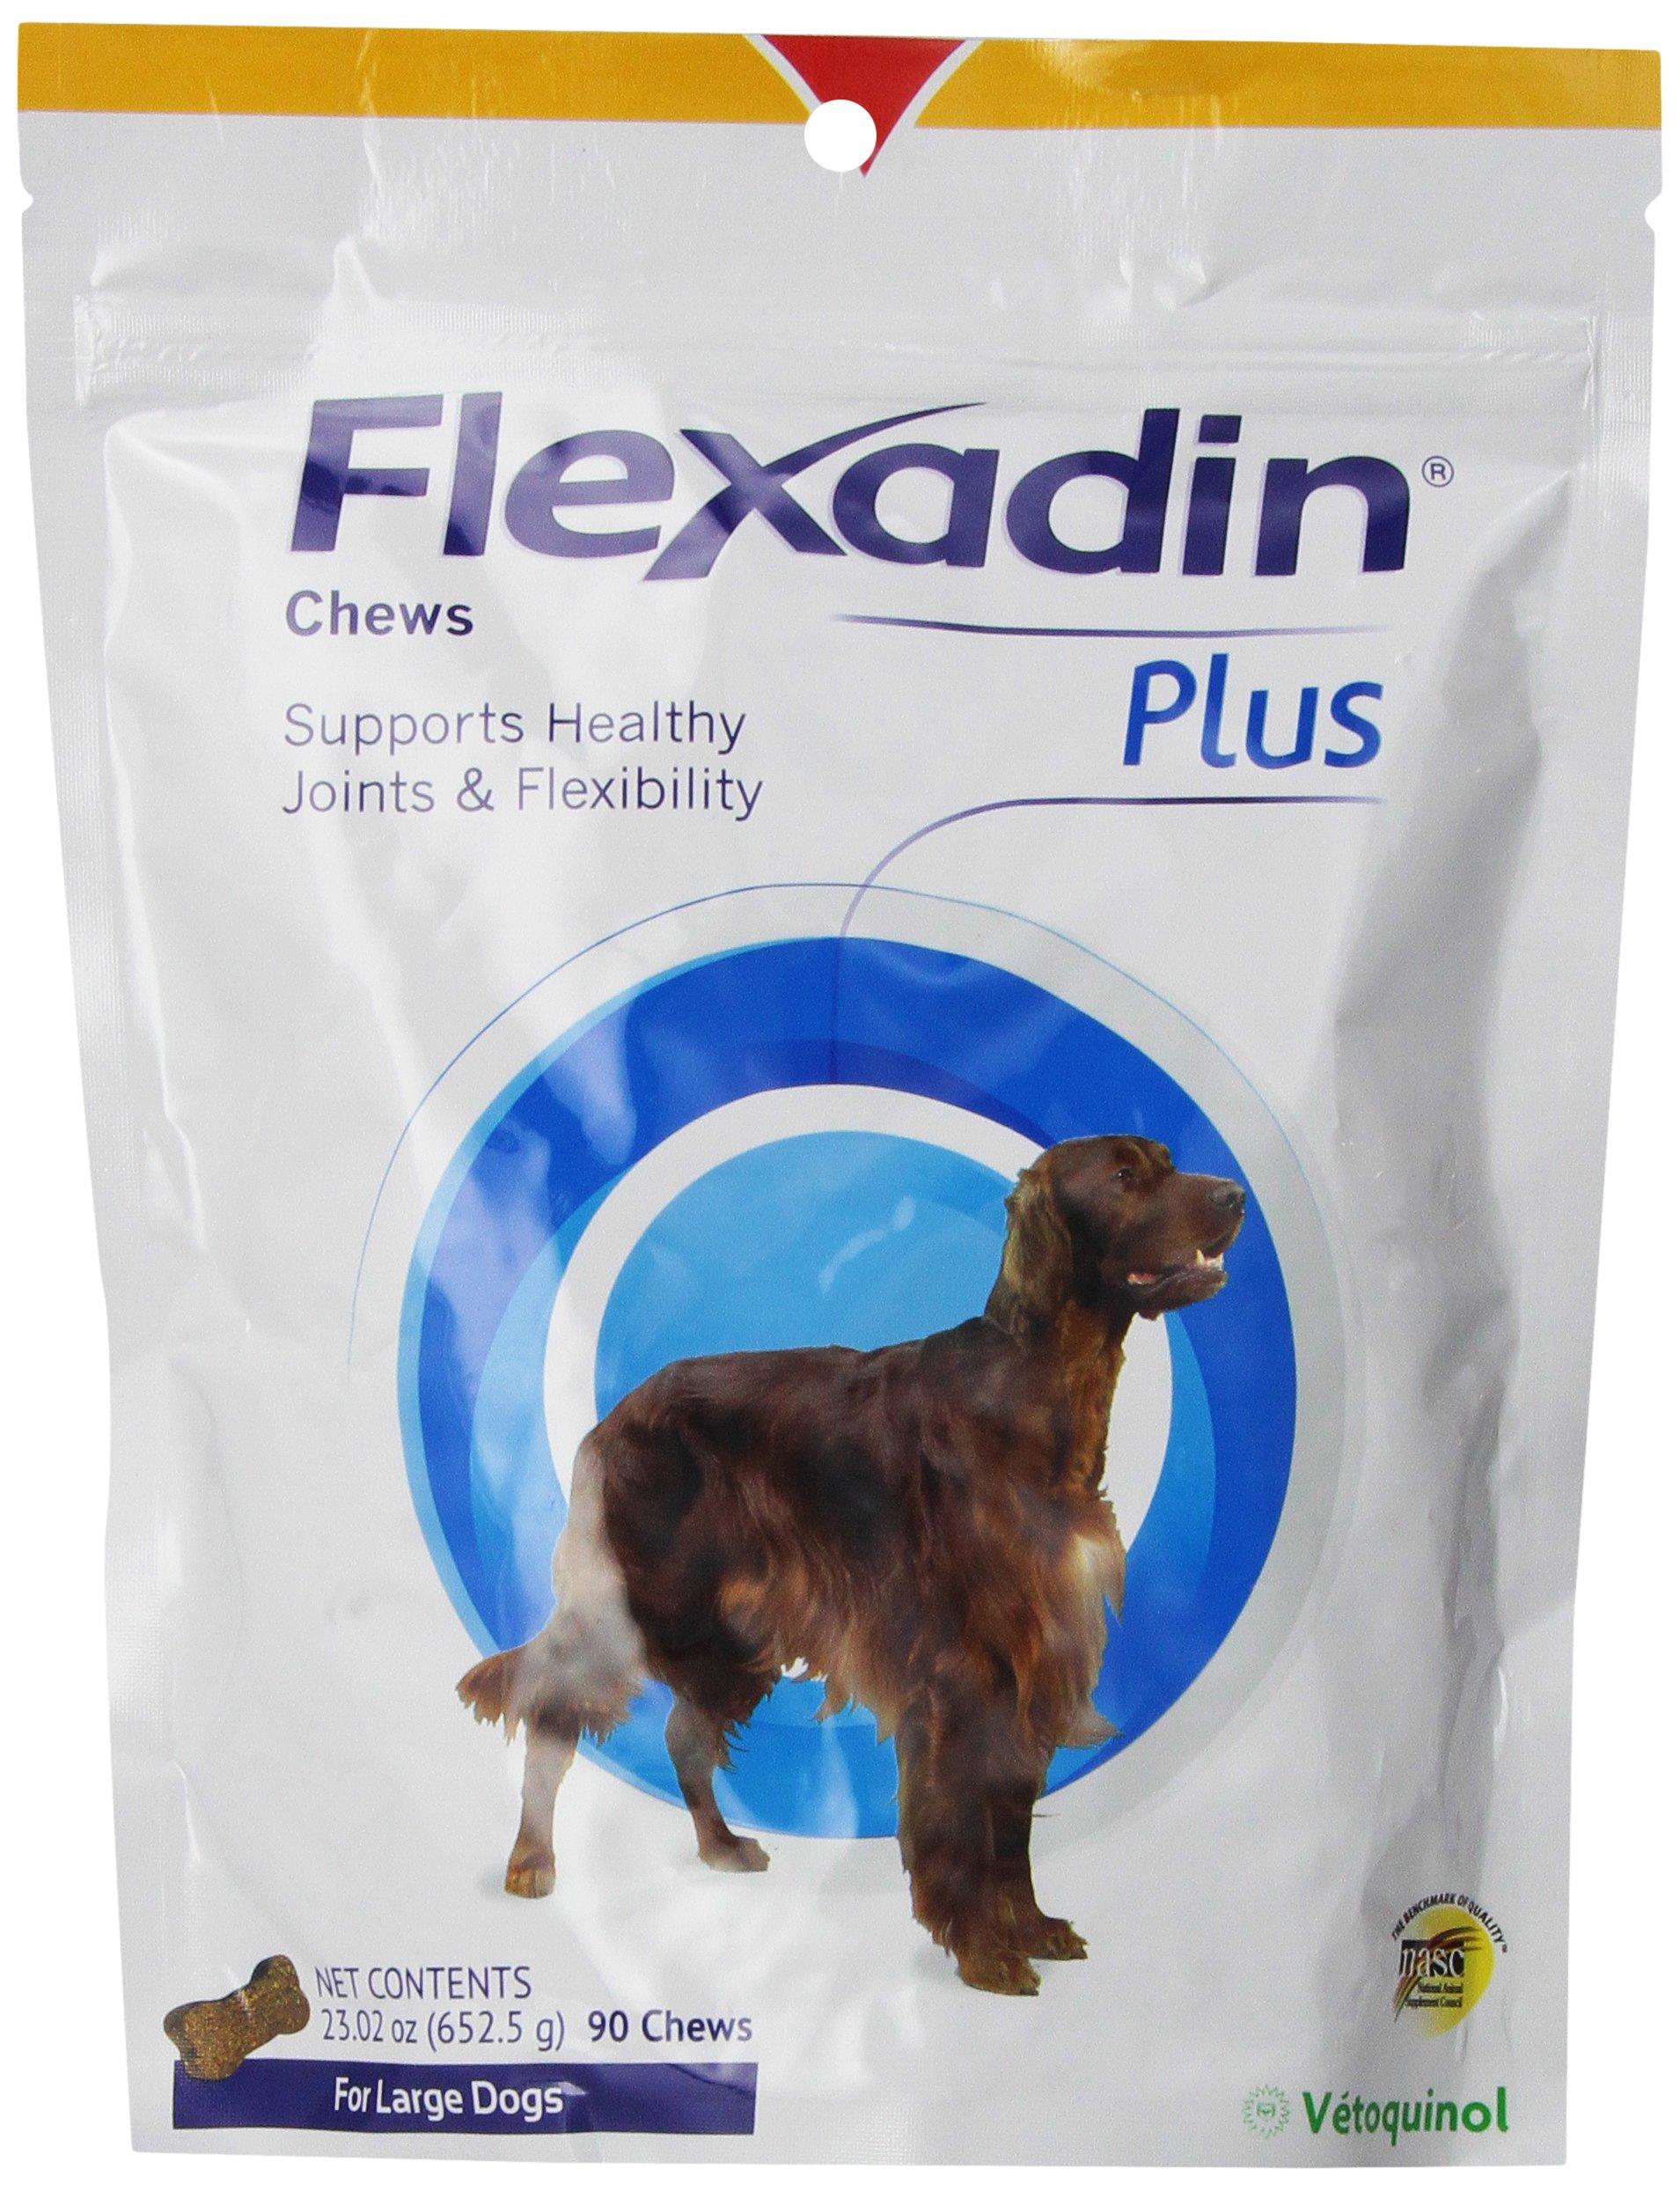 VETOQUINOL Flexadin Plus Chews for Large Dogs, 90 Chews 23.02 oz. by Vetoquinol